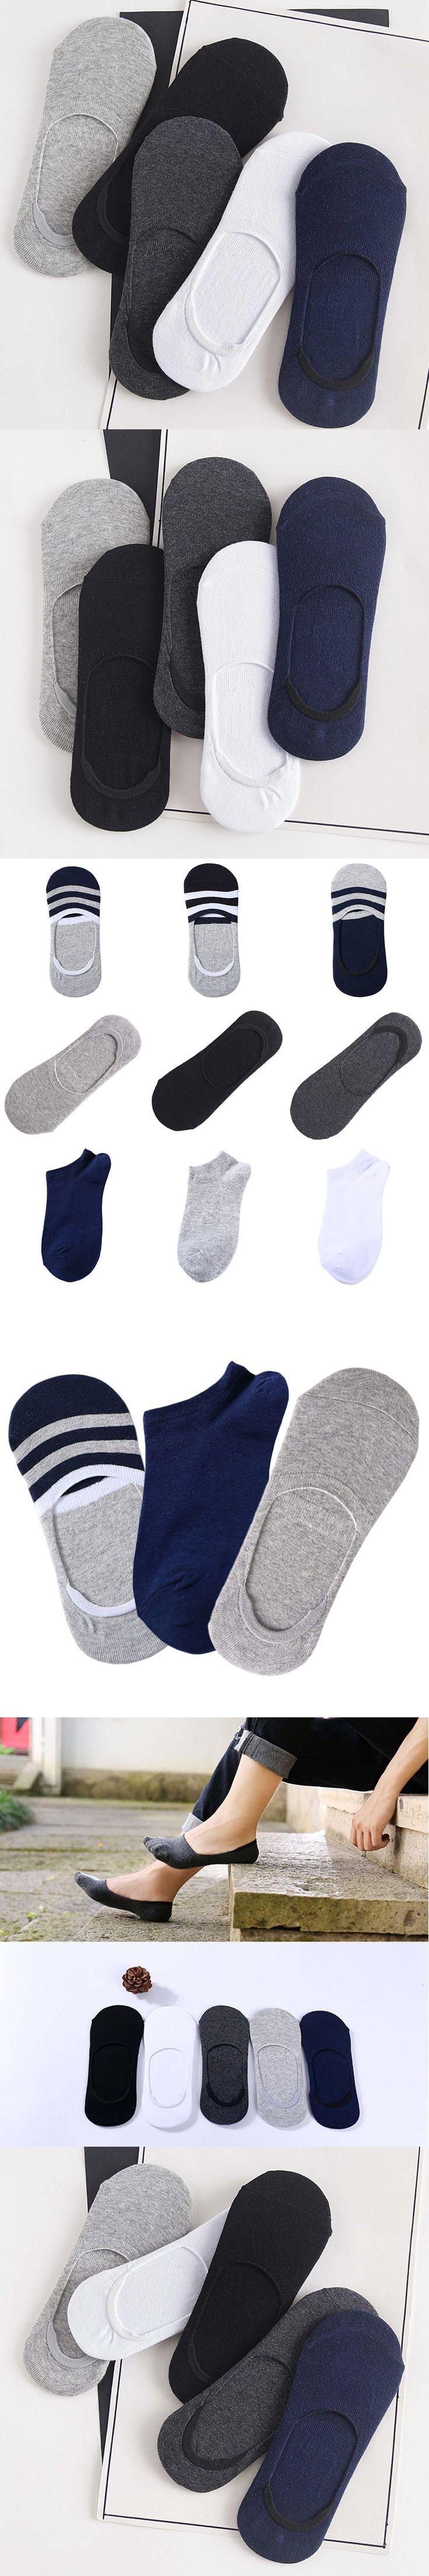 New Arrival Fashion Mens Short Socks Cotton Solid Color Socks Summer Casual Breathable Socks Invisible Socks